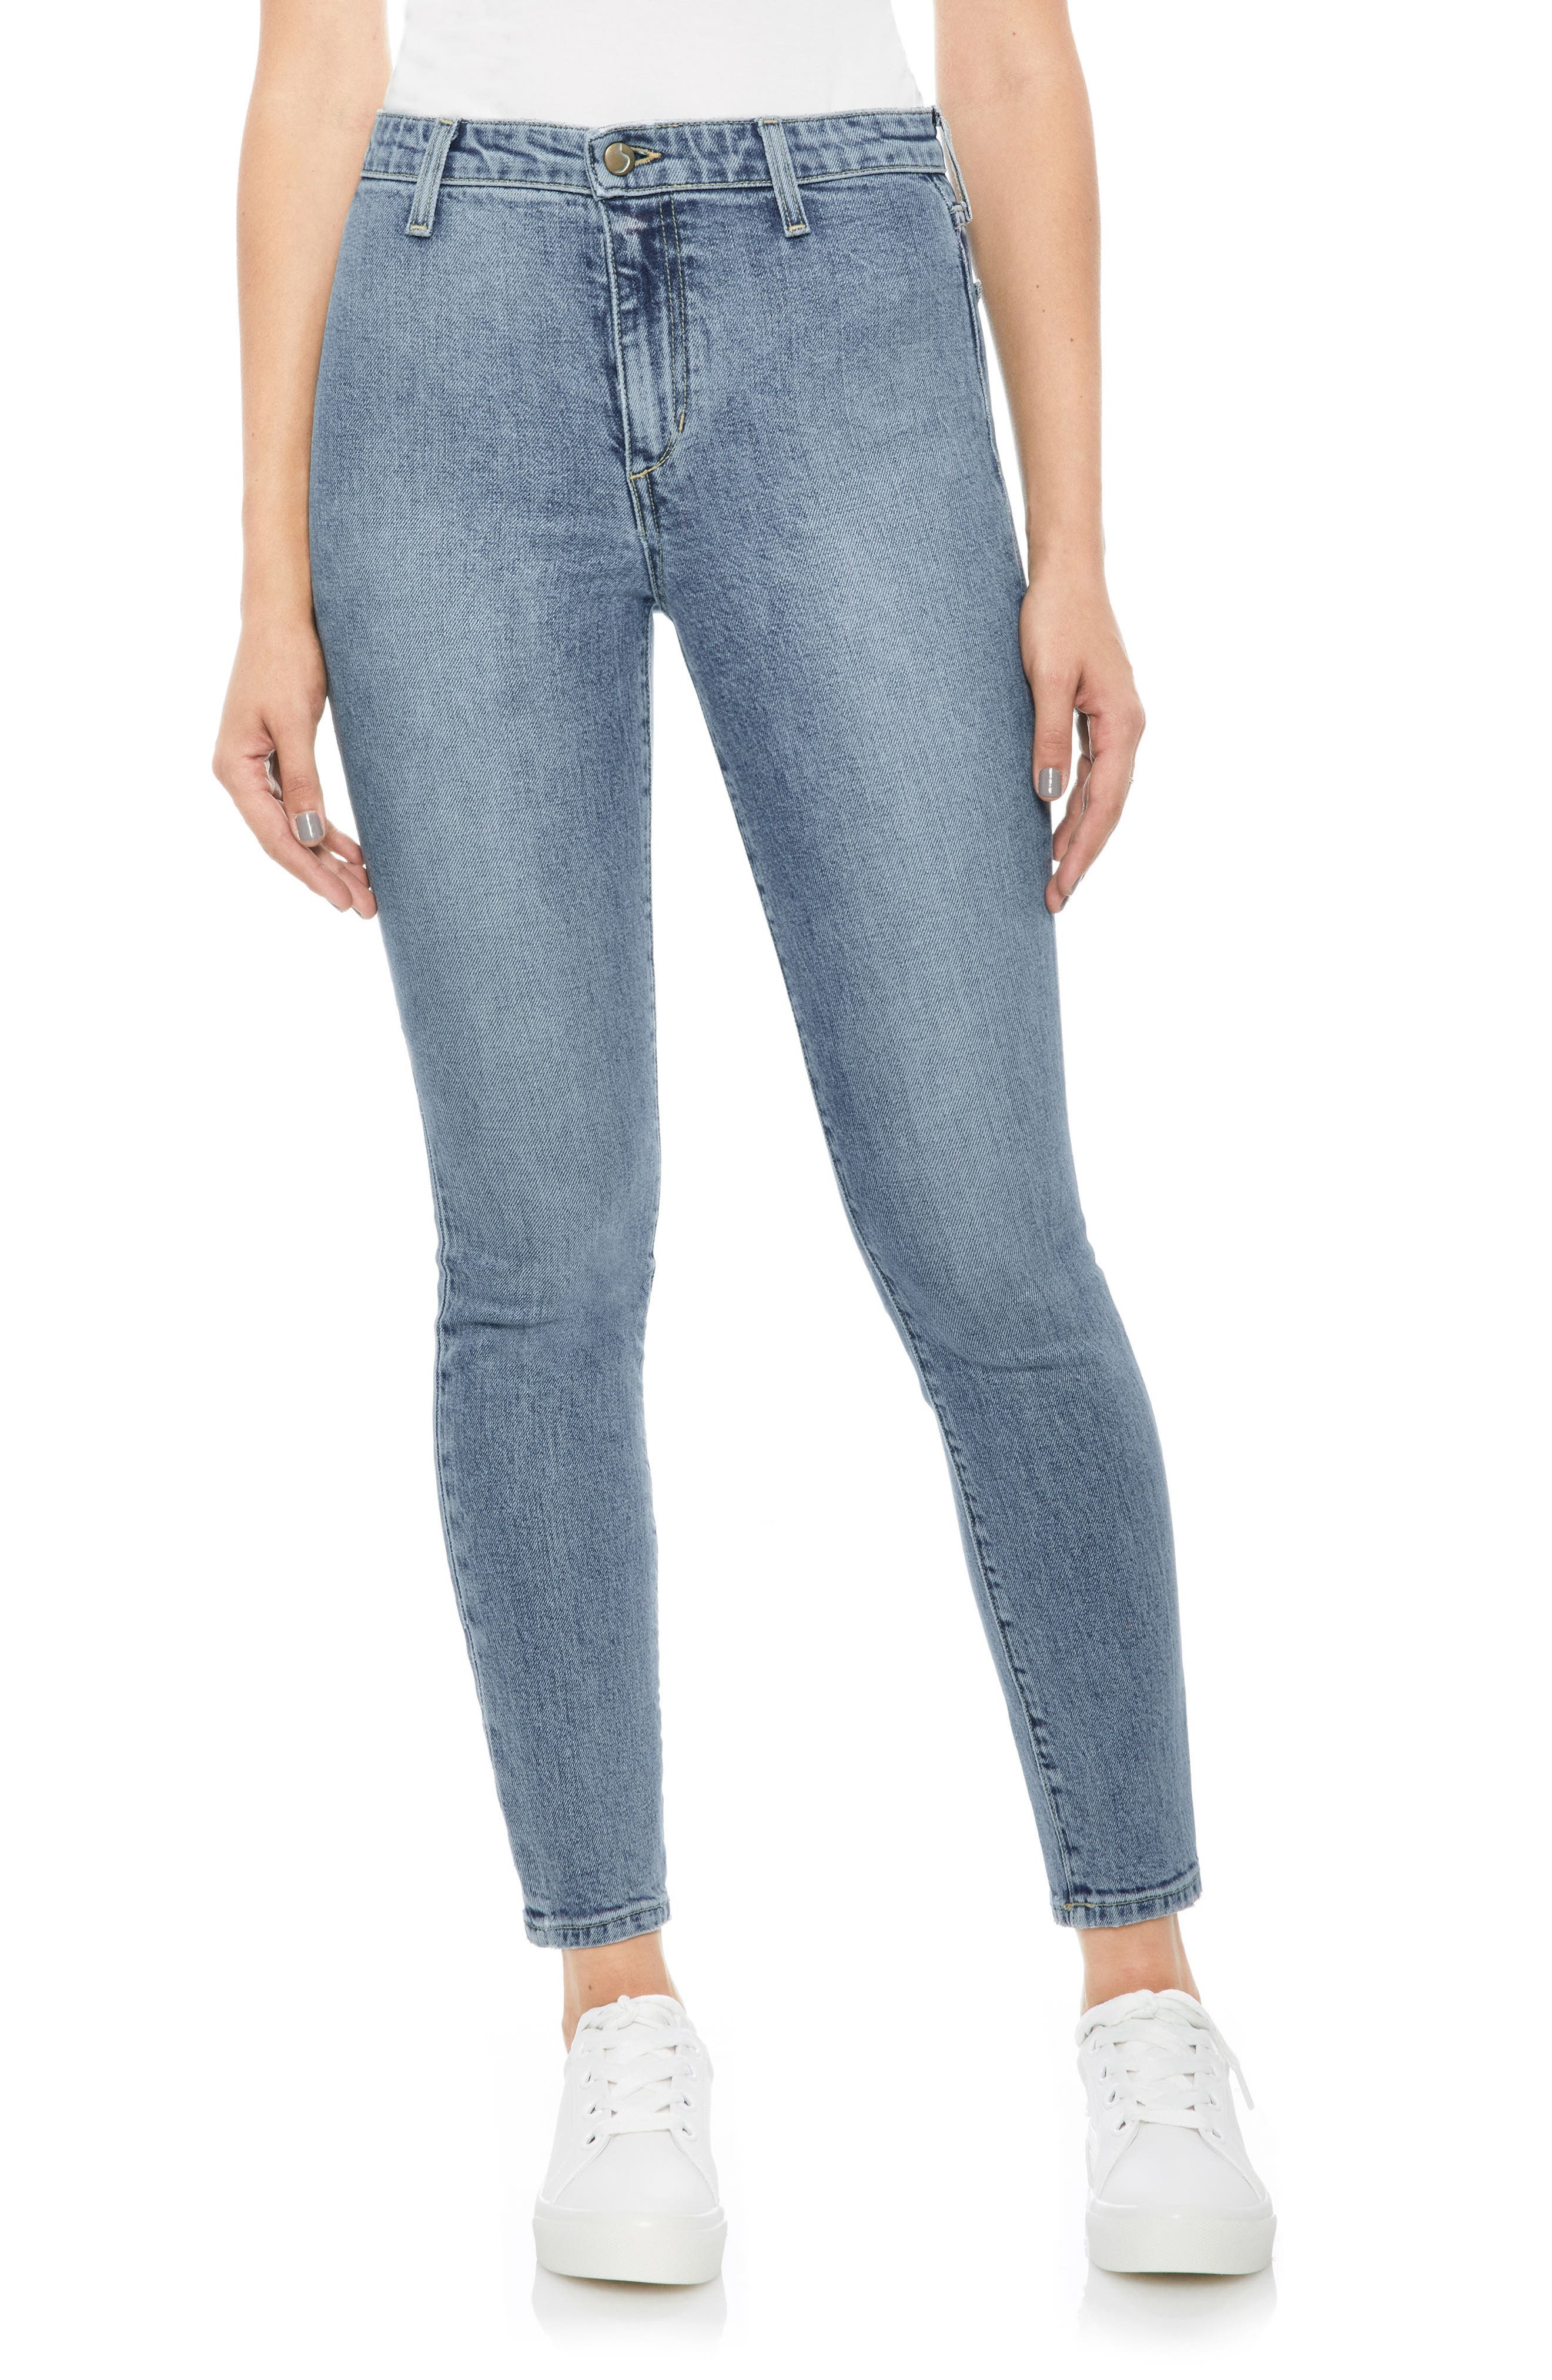 JOE'S,                             Charlie High Waist Ankle Skinny Jeans,                             Main thumbnail 1, color,                             415